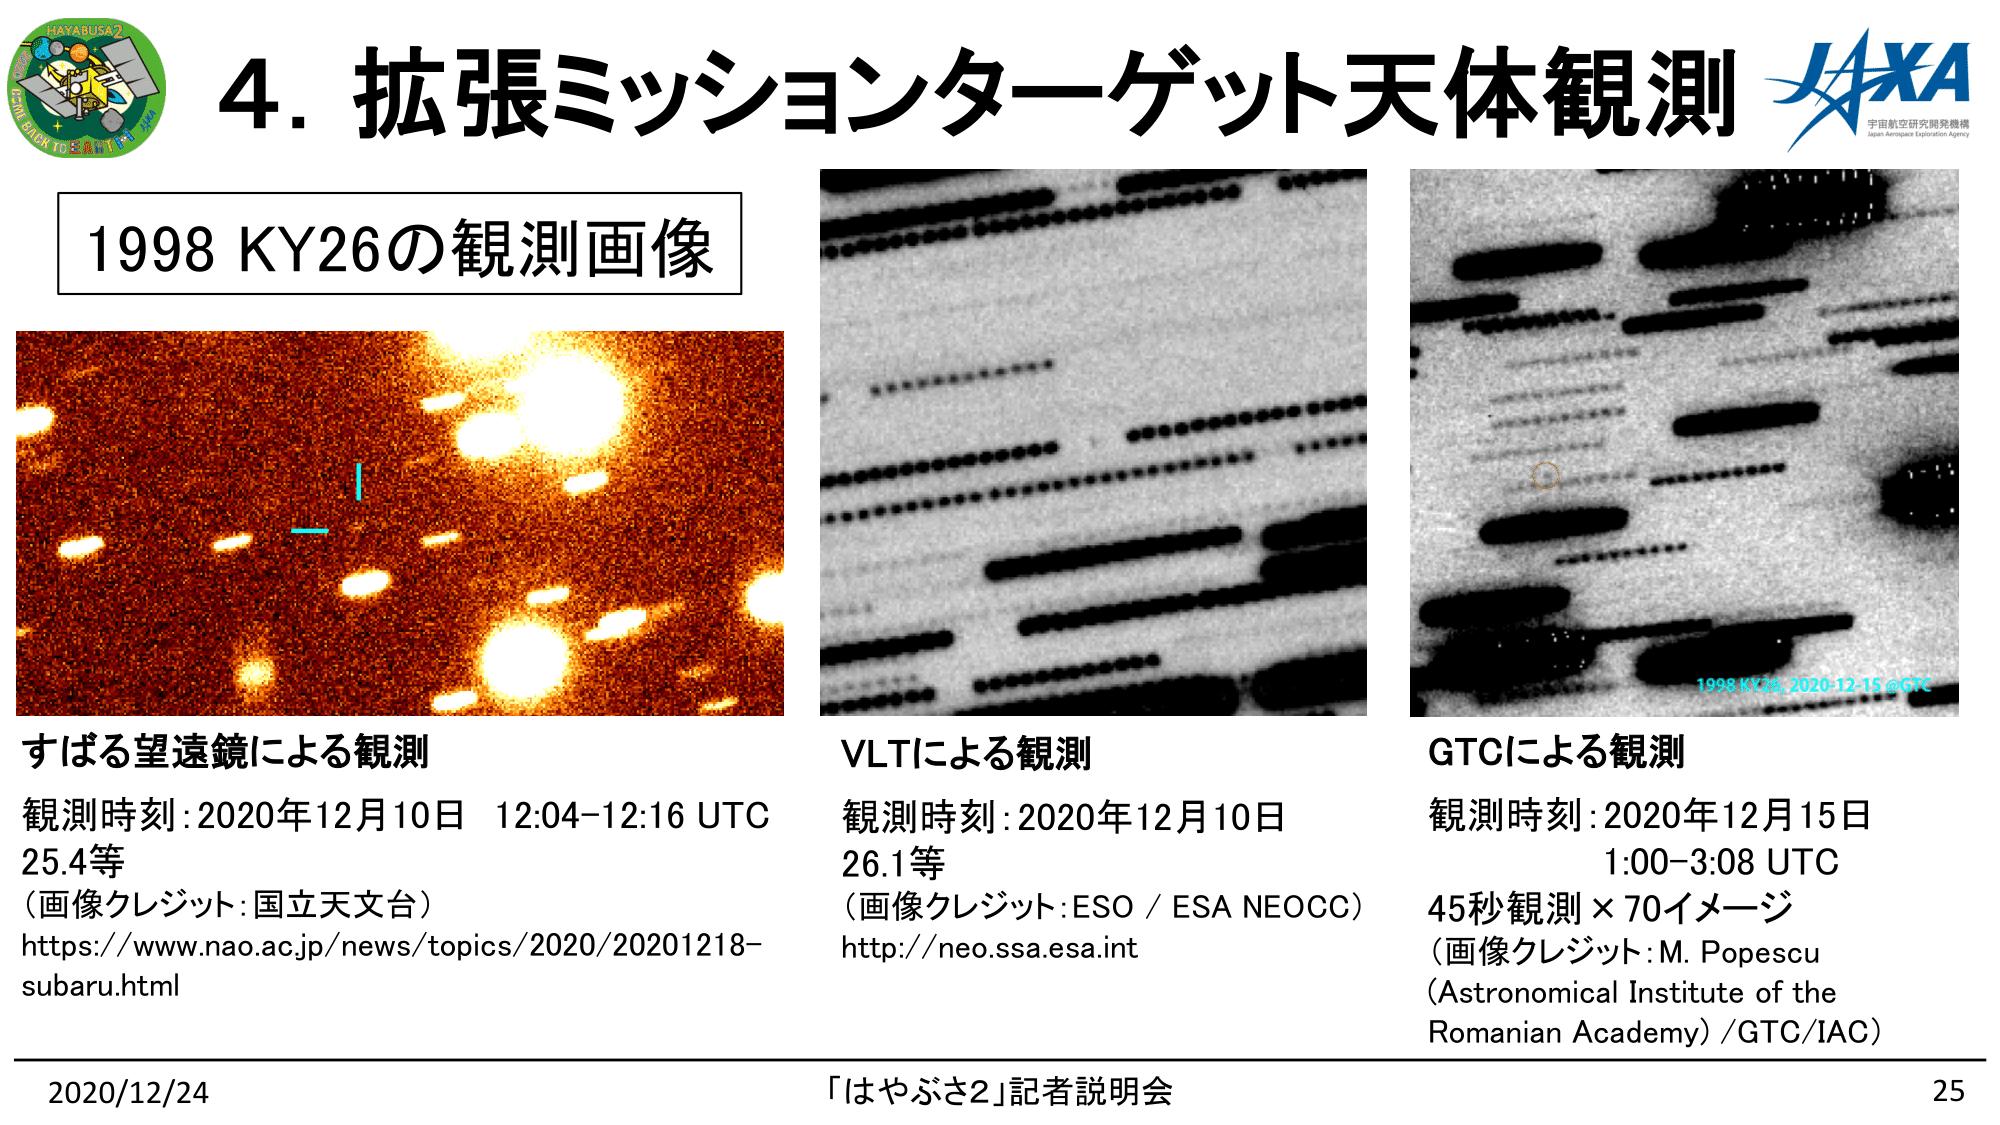 f:id:Imamura:20201224135244p:plain